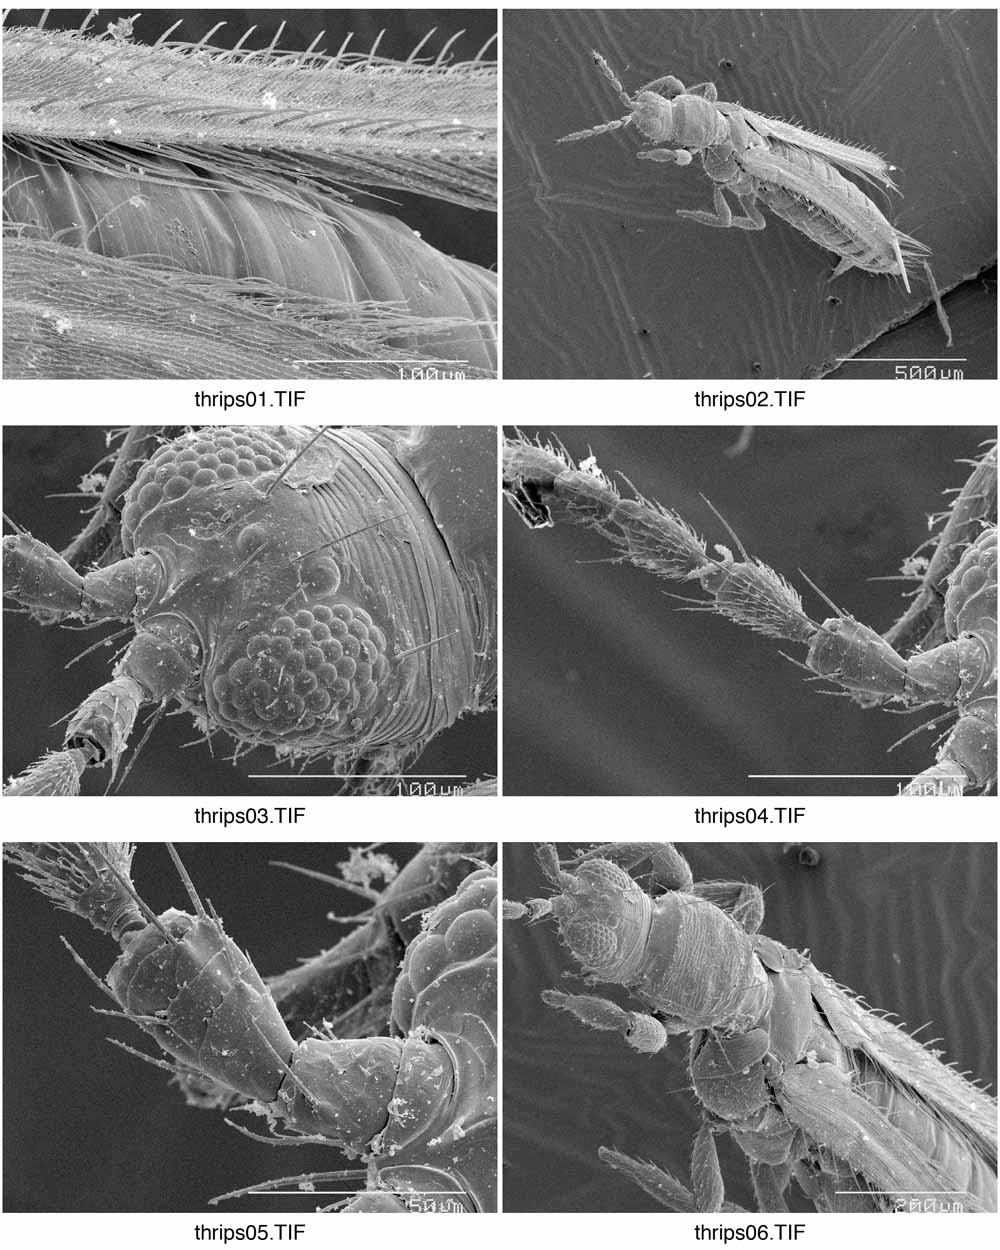 scanning electron micrographs  sem  of thysanoptera